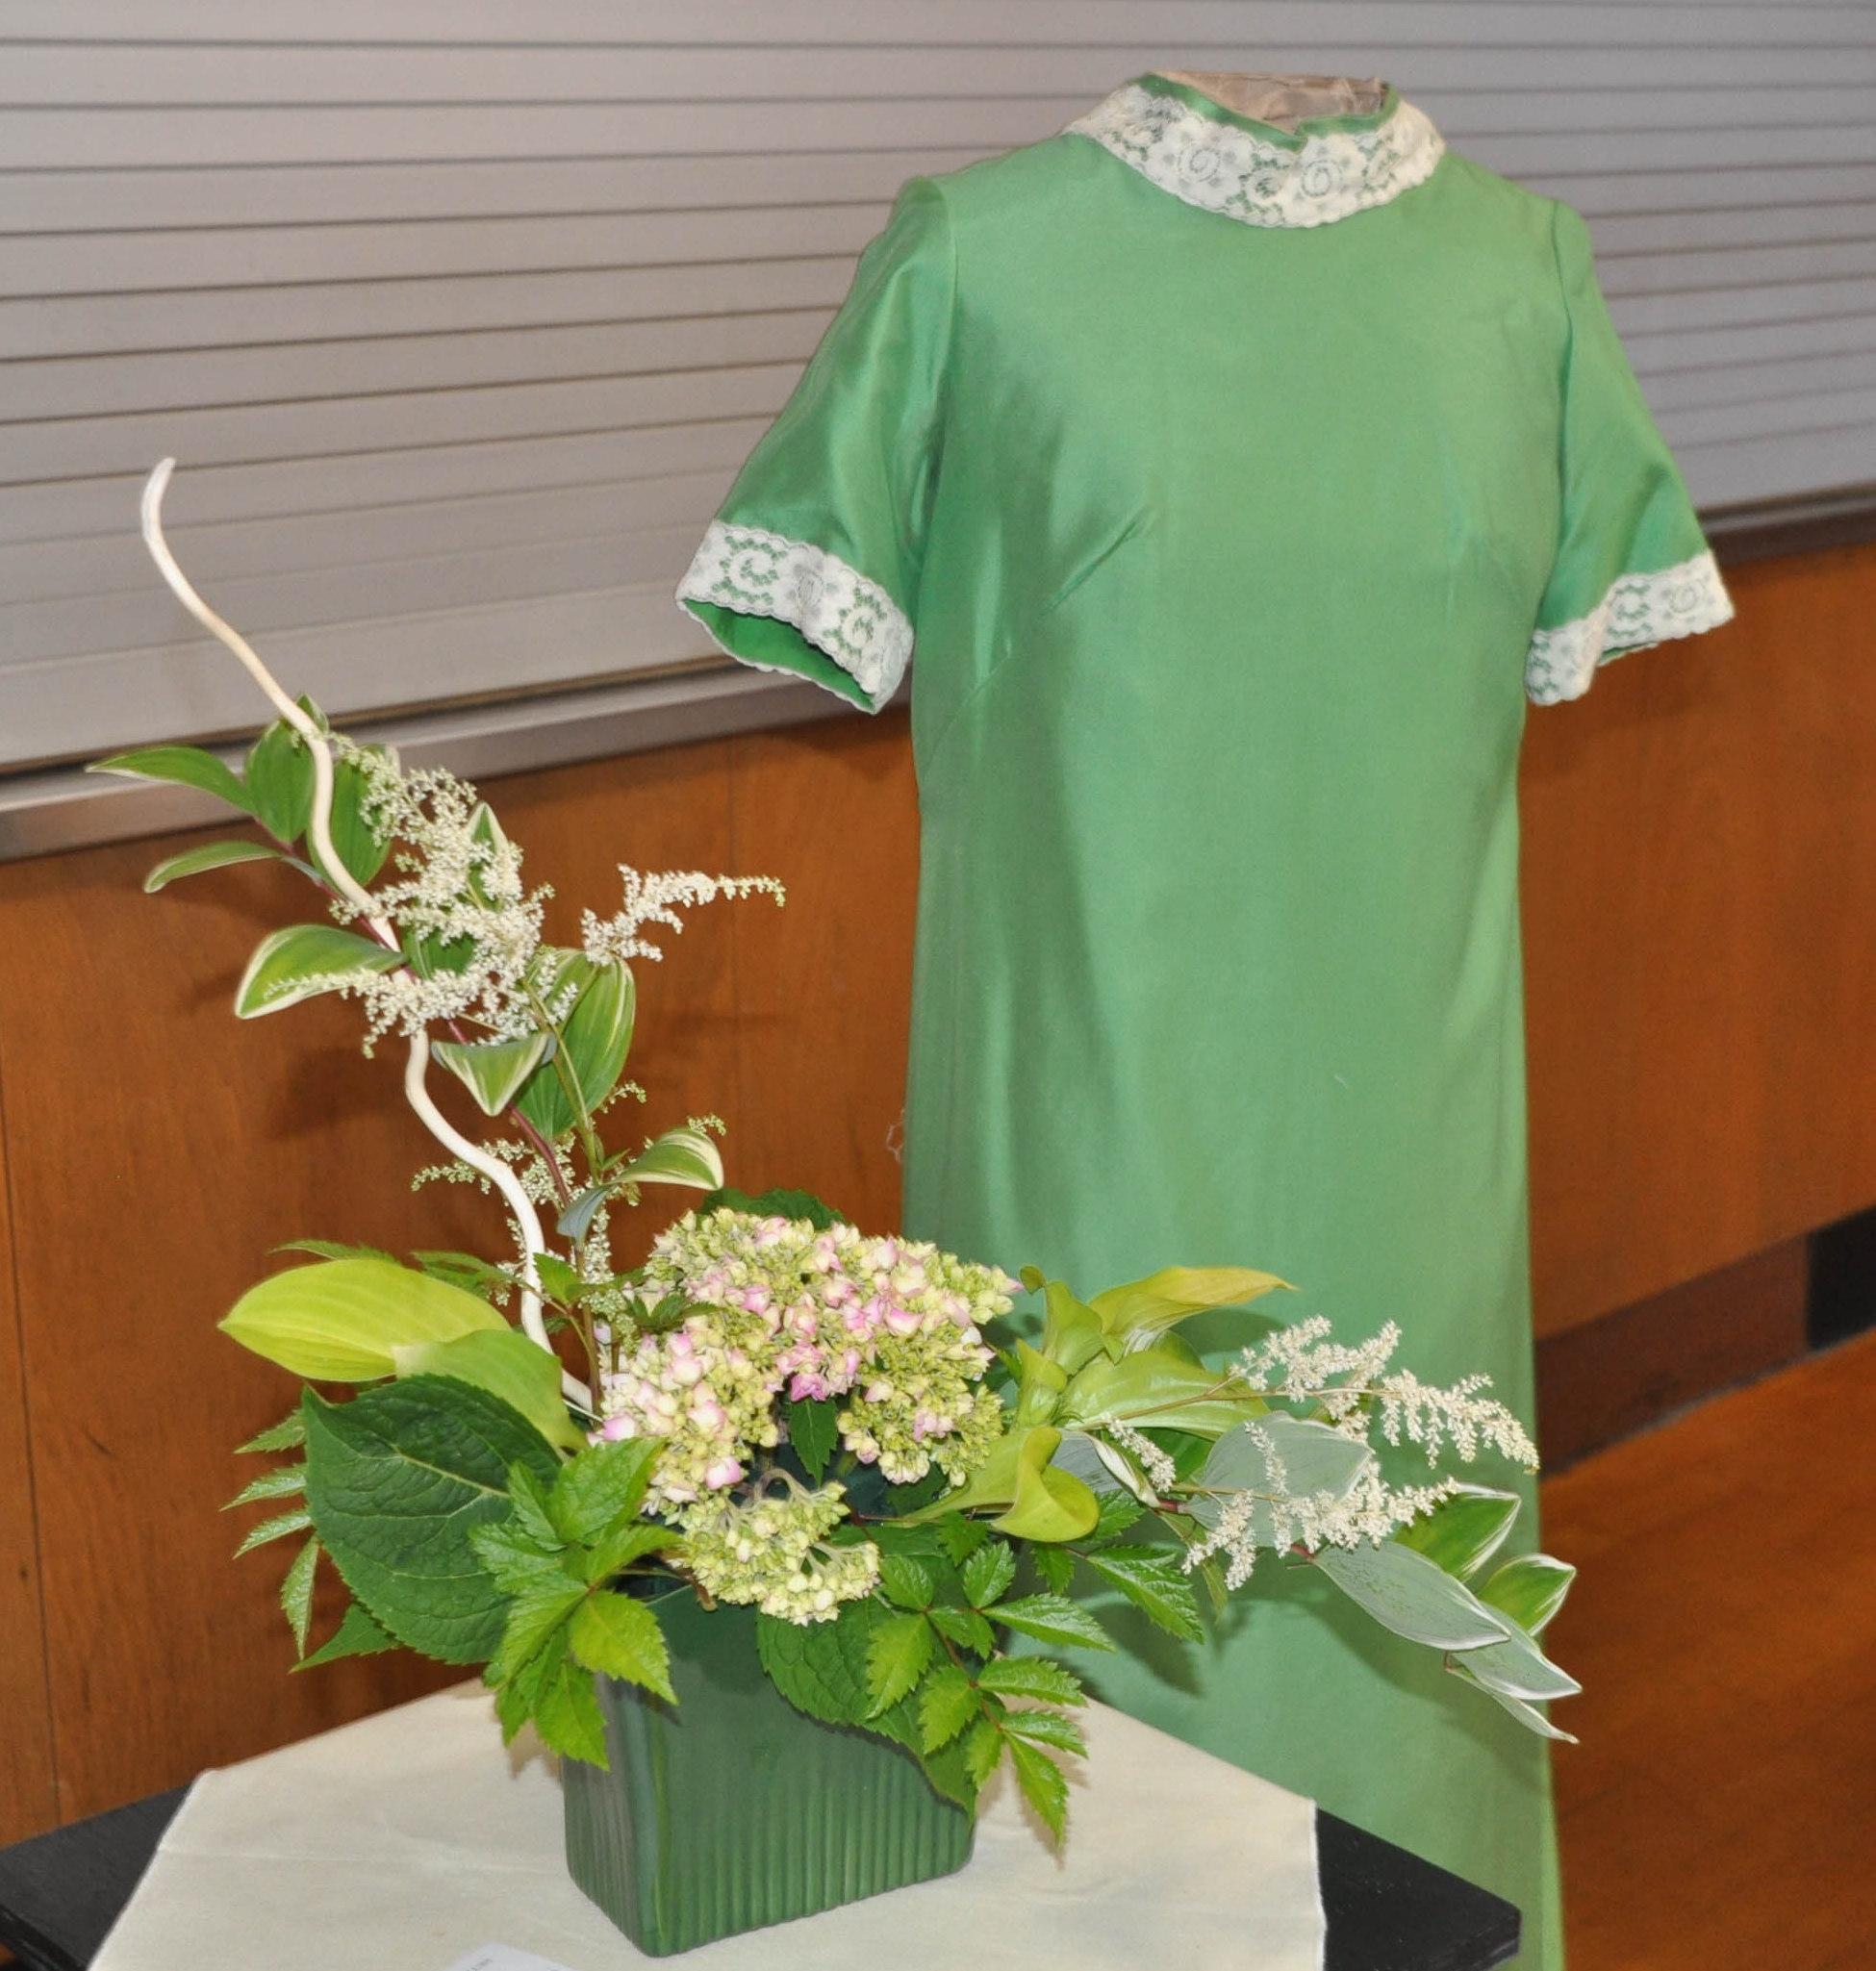 11arrangement and bridesmaid dress cr.jpg